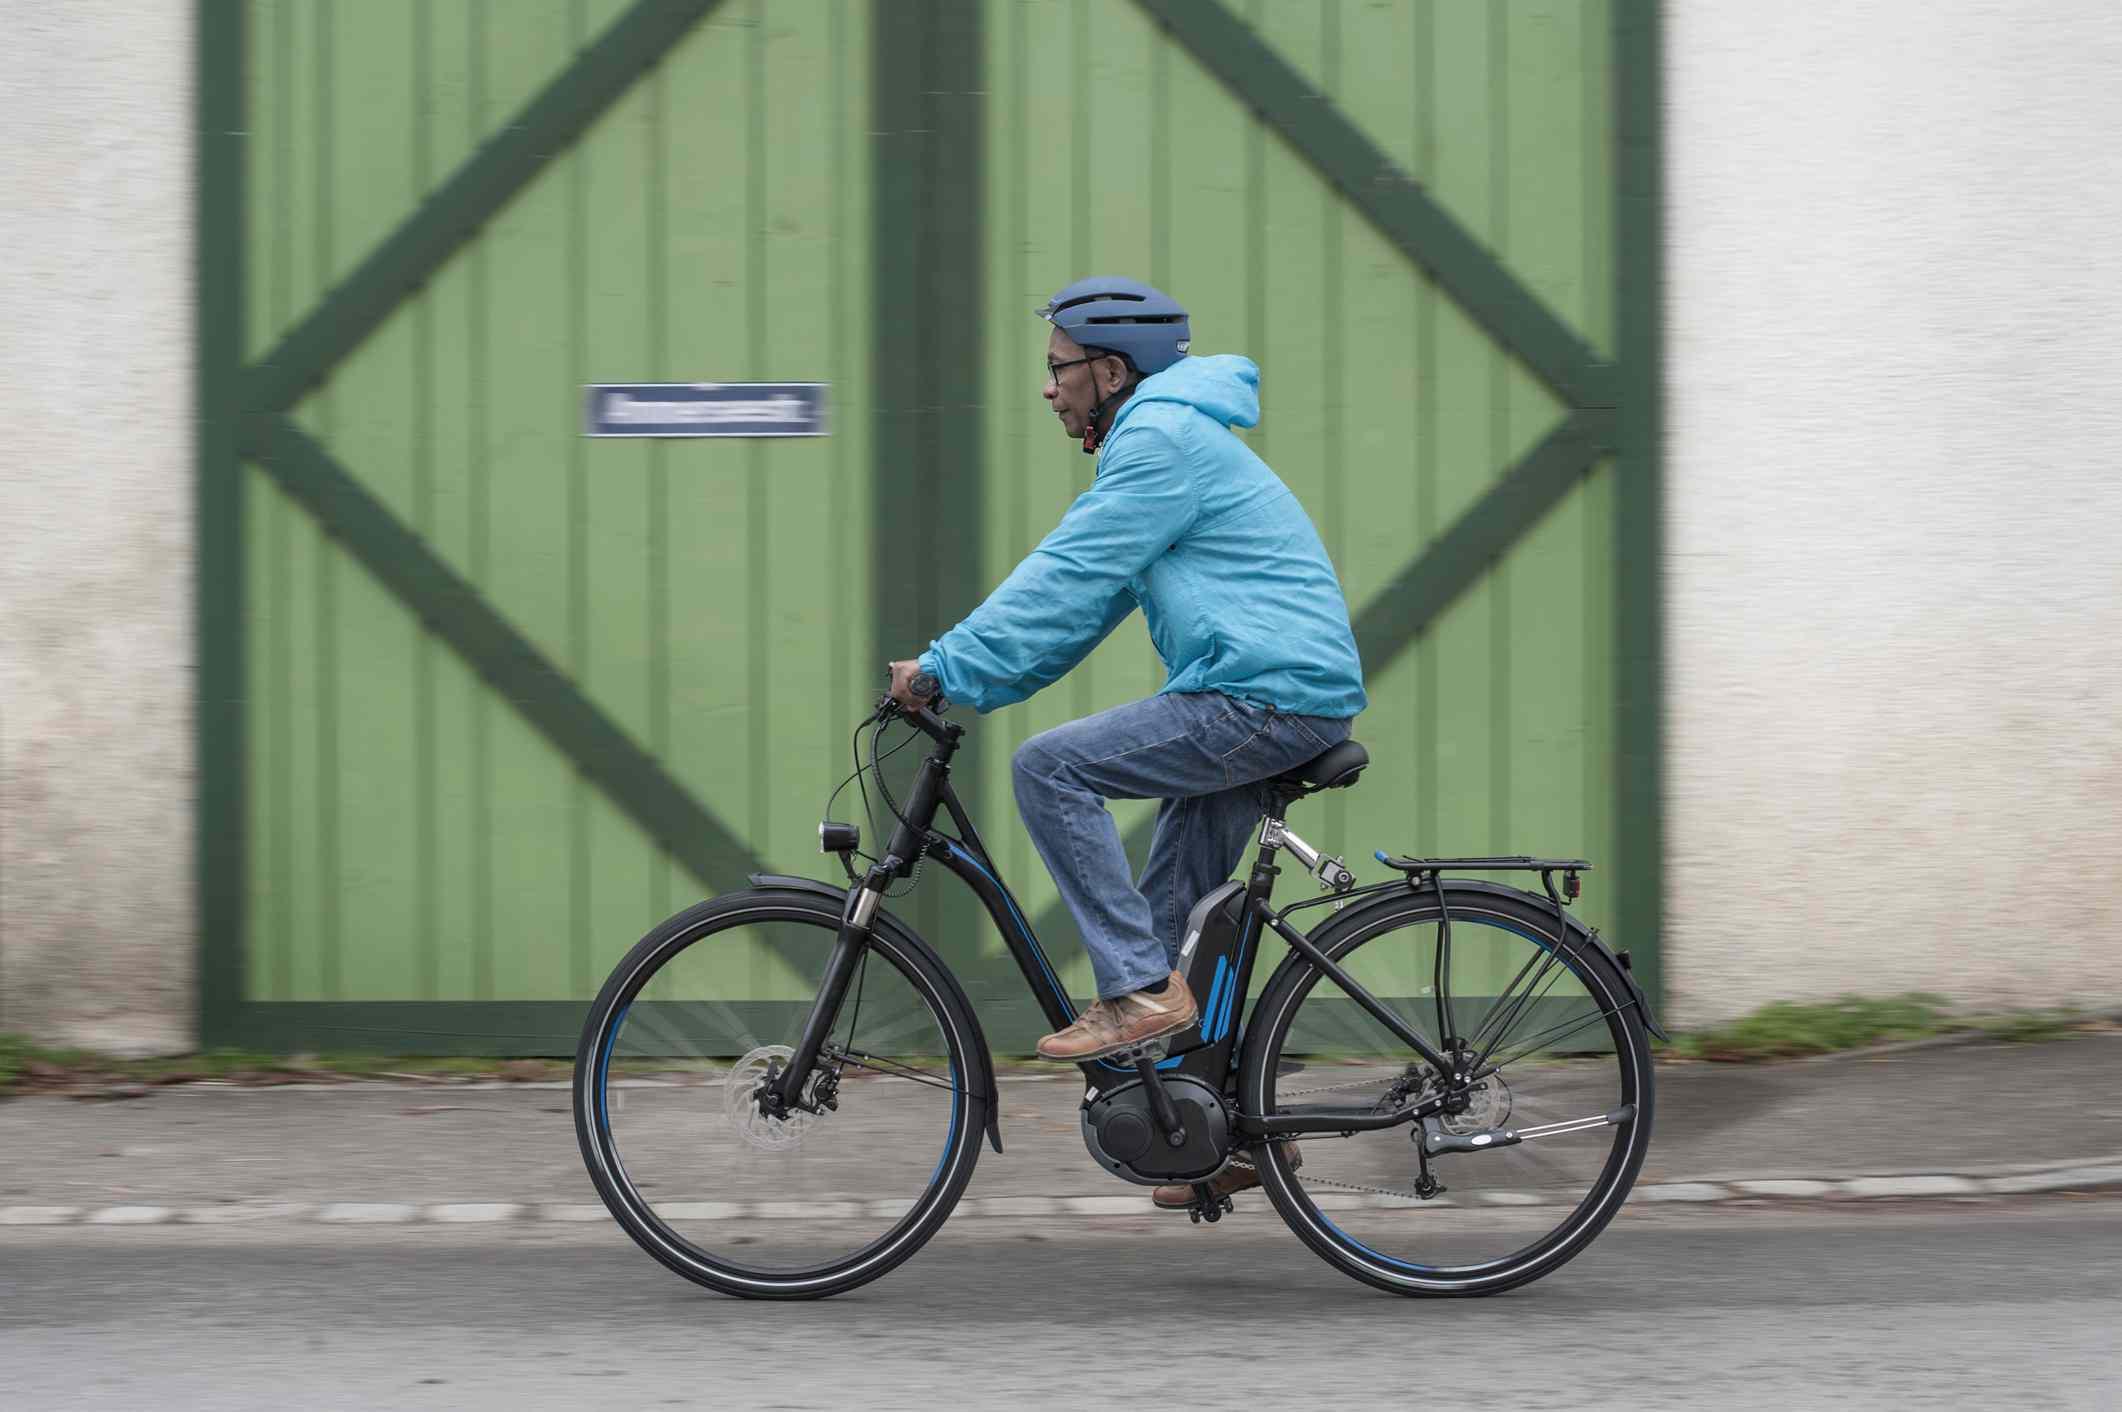 man riding an electric bike / e-bike